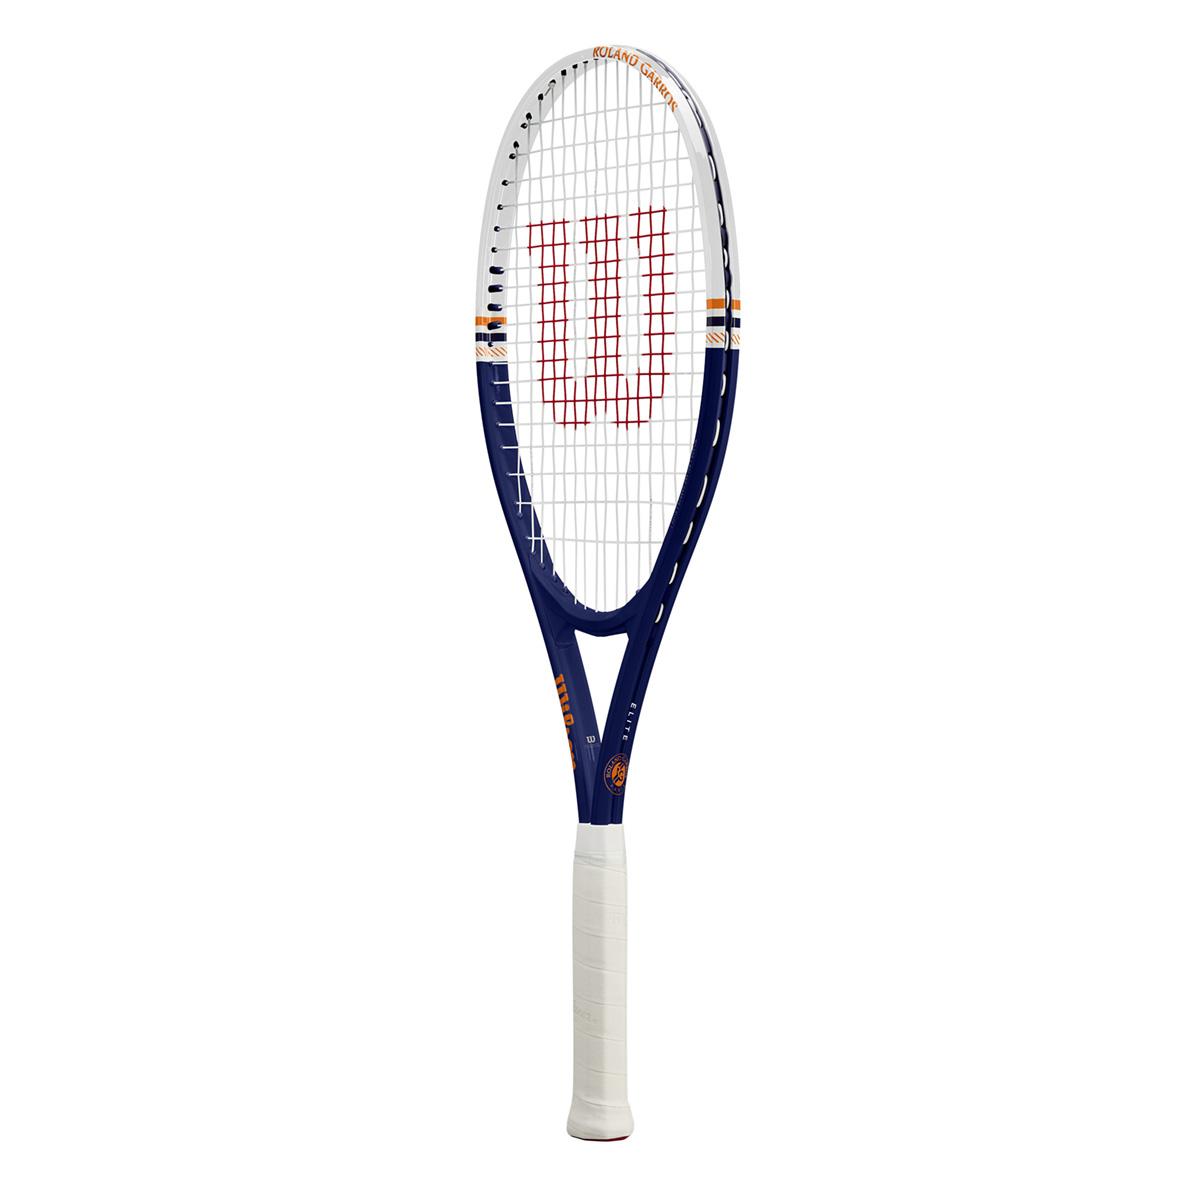 WR070410U_2_Roland_Garros_Elite_Adult_WH_NA.png.cq5dam.web.2000.2000